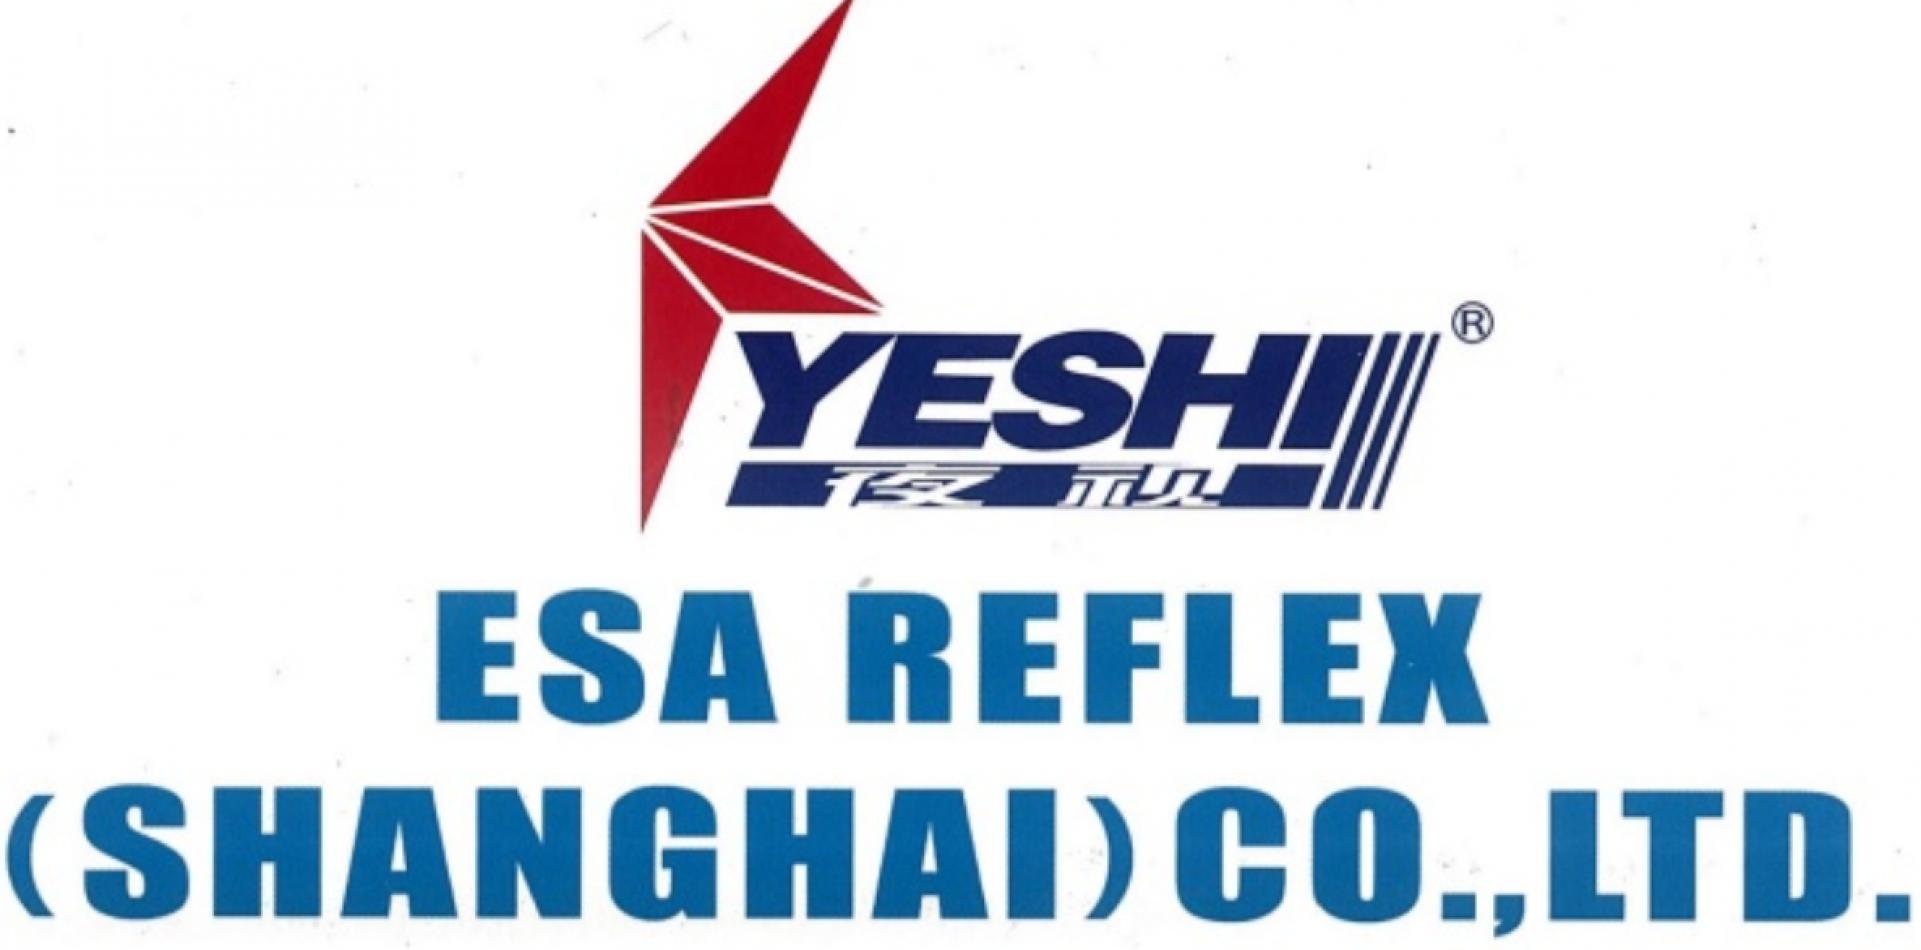 ESA REFLEX (SHANGHAI) CO., LTD